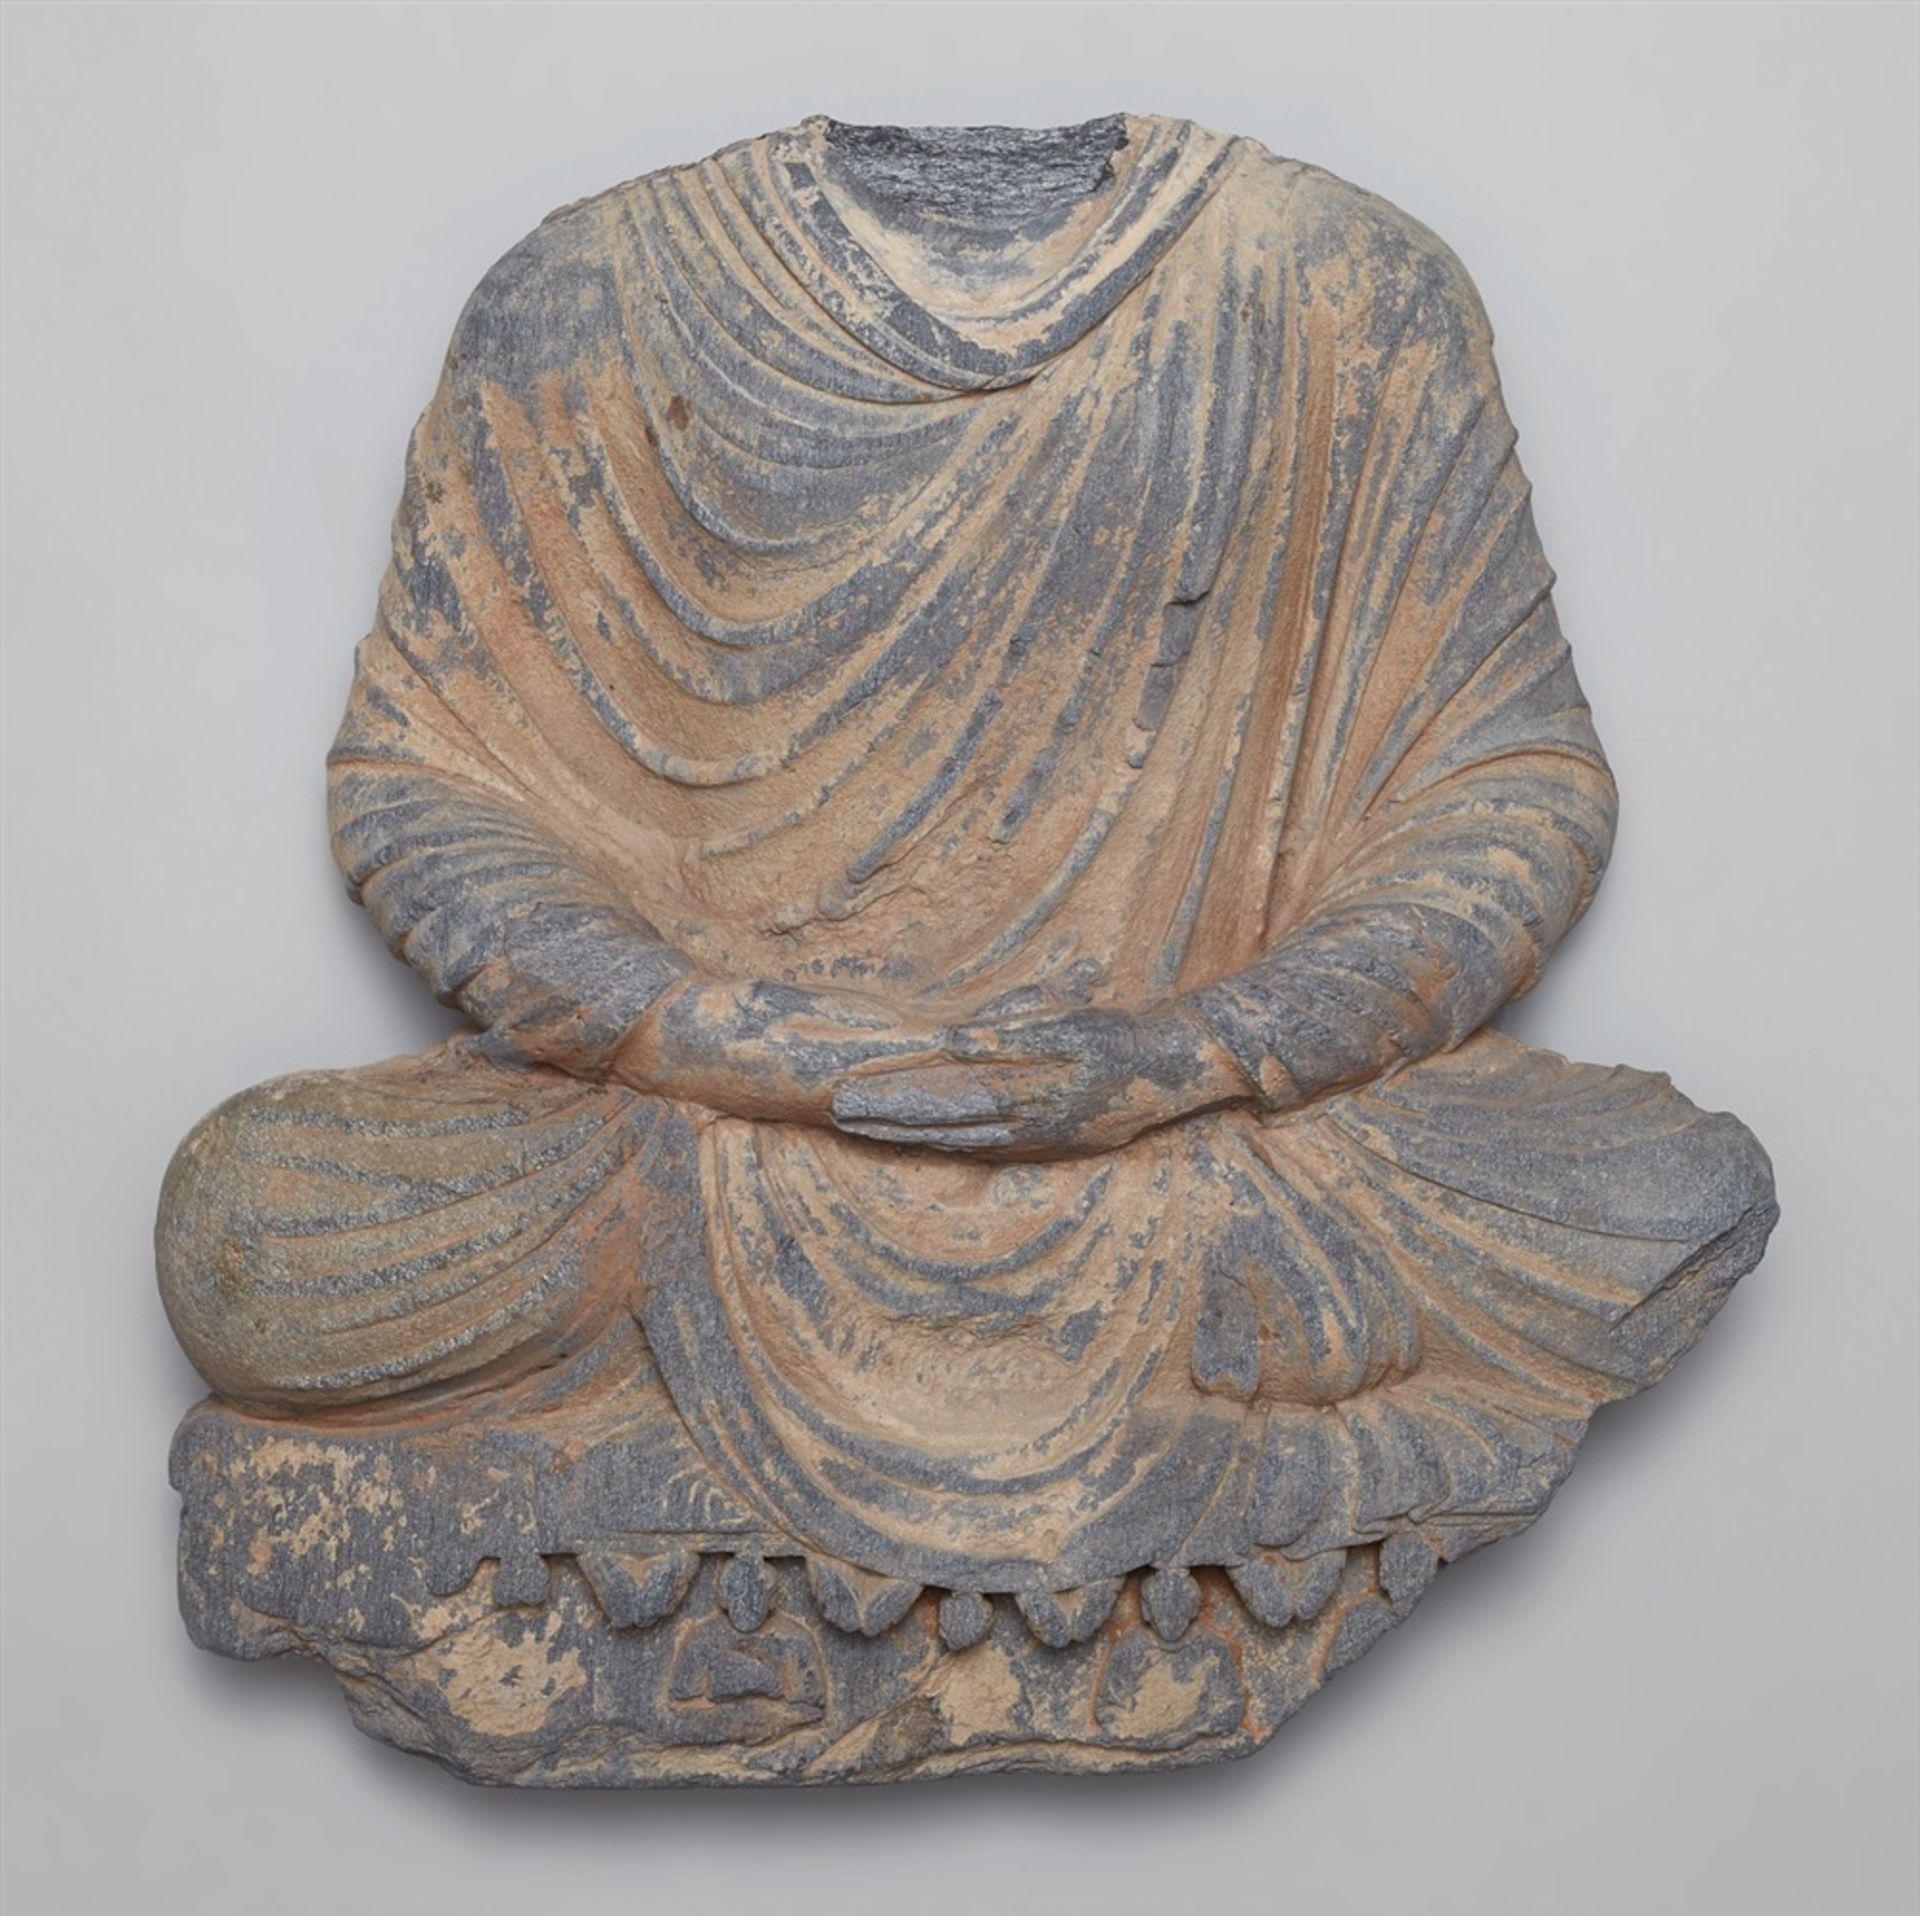 Torso eines Buddha Shakyamuni. Grauer Schist. Pakistan, Gandhara. 2./3. Jh.